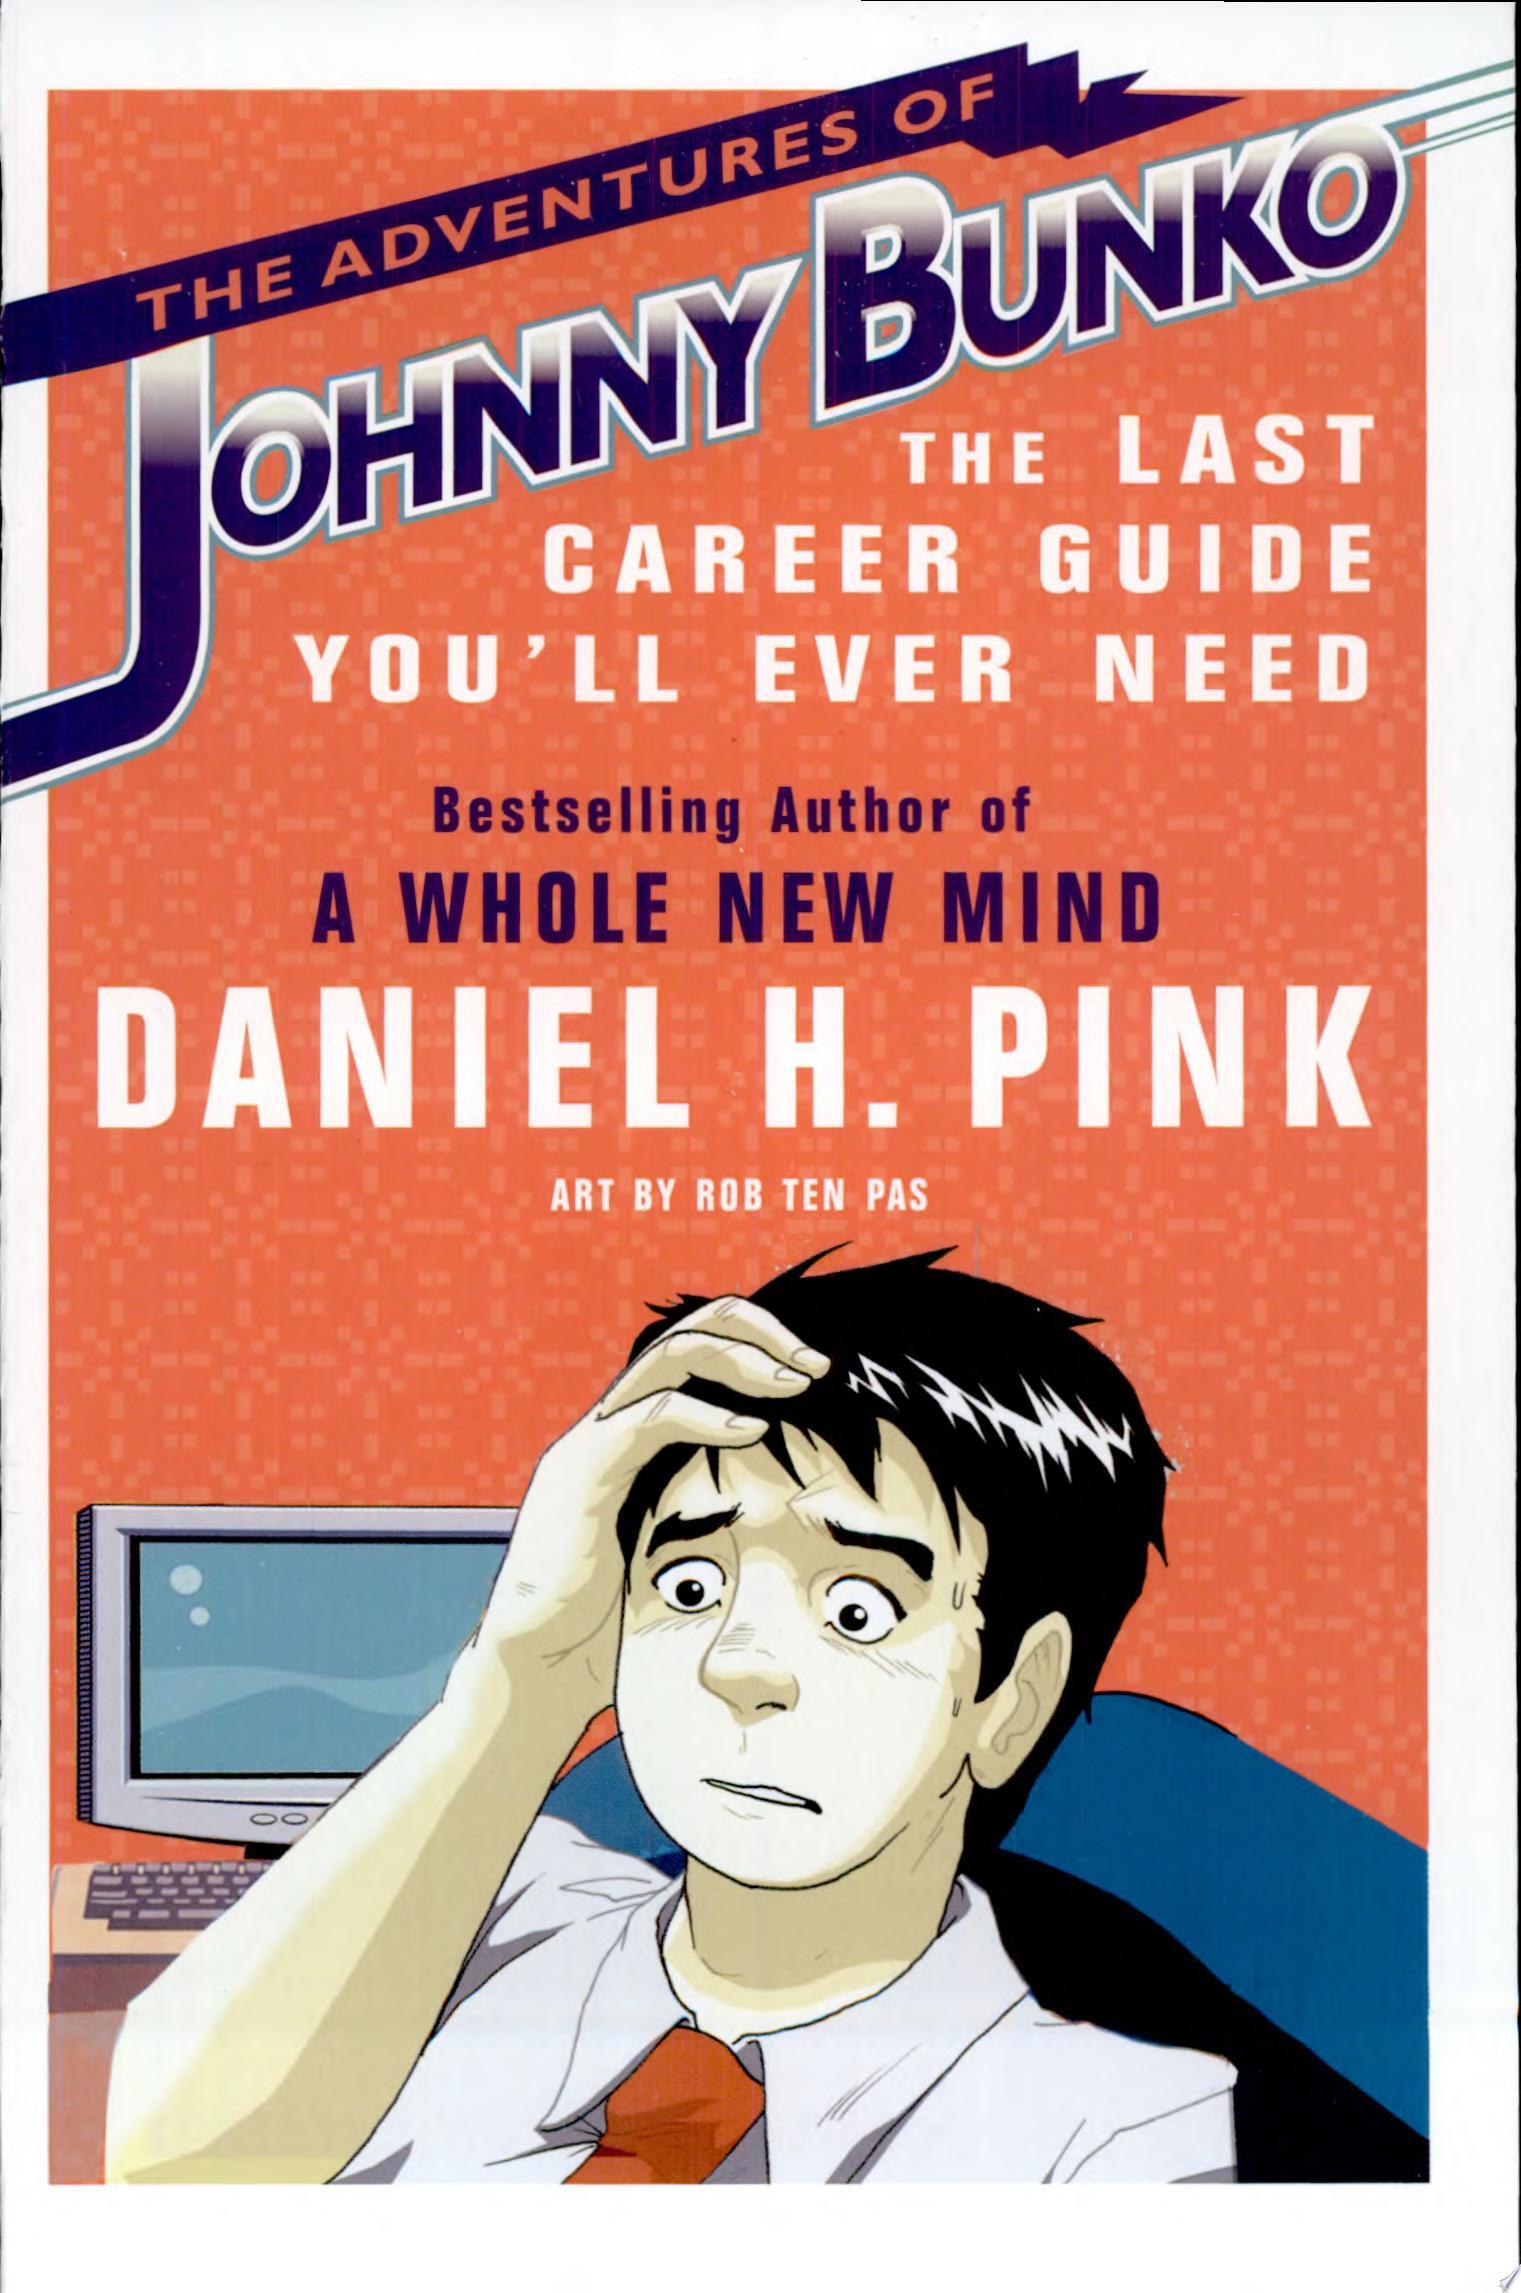 The Adventures of Johnny Bunko